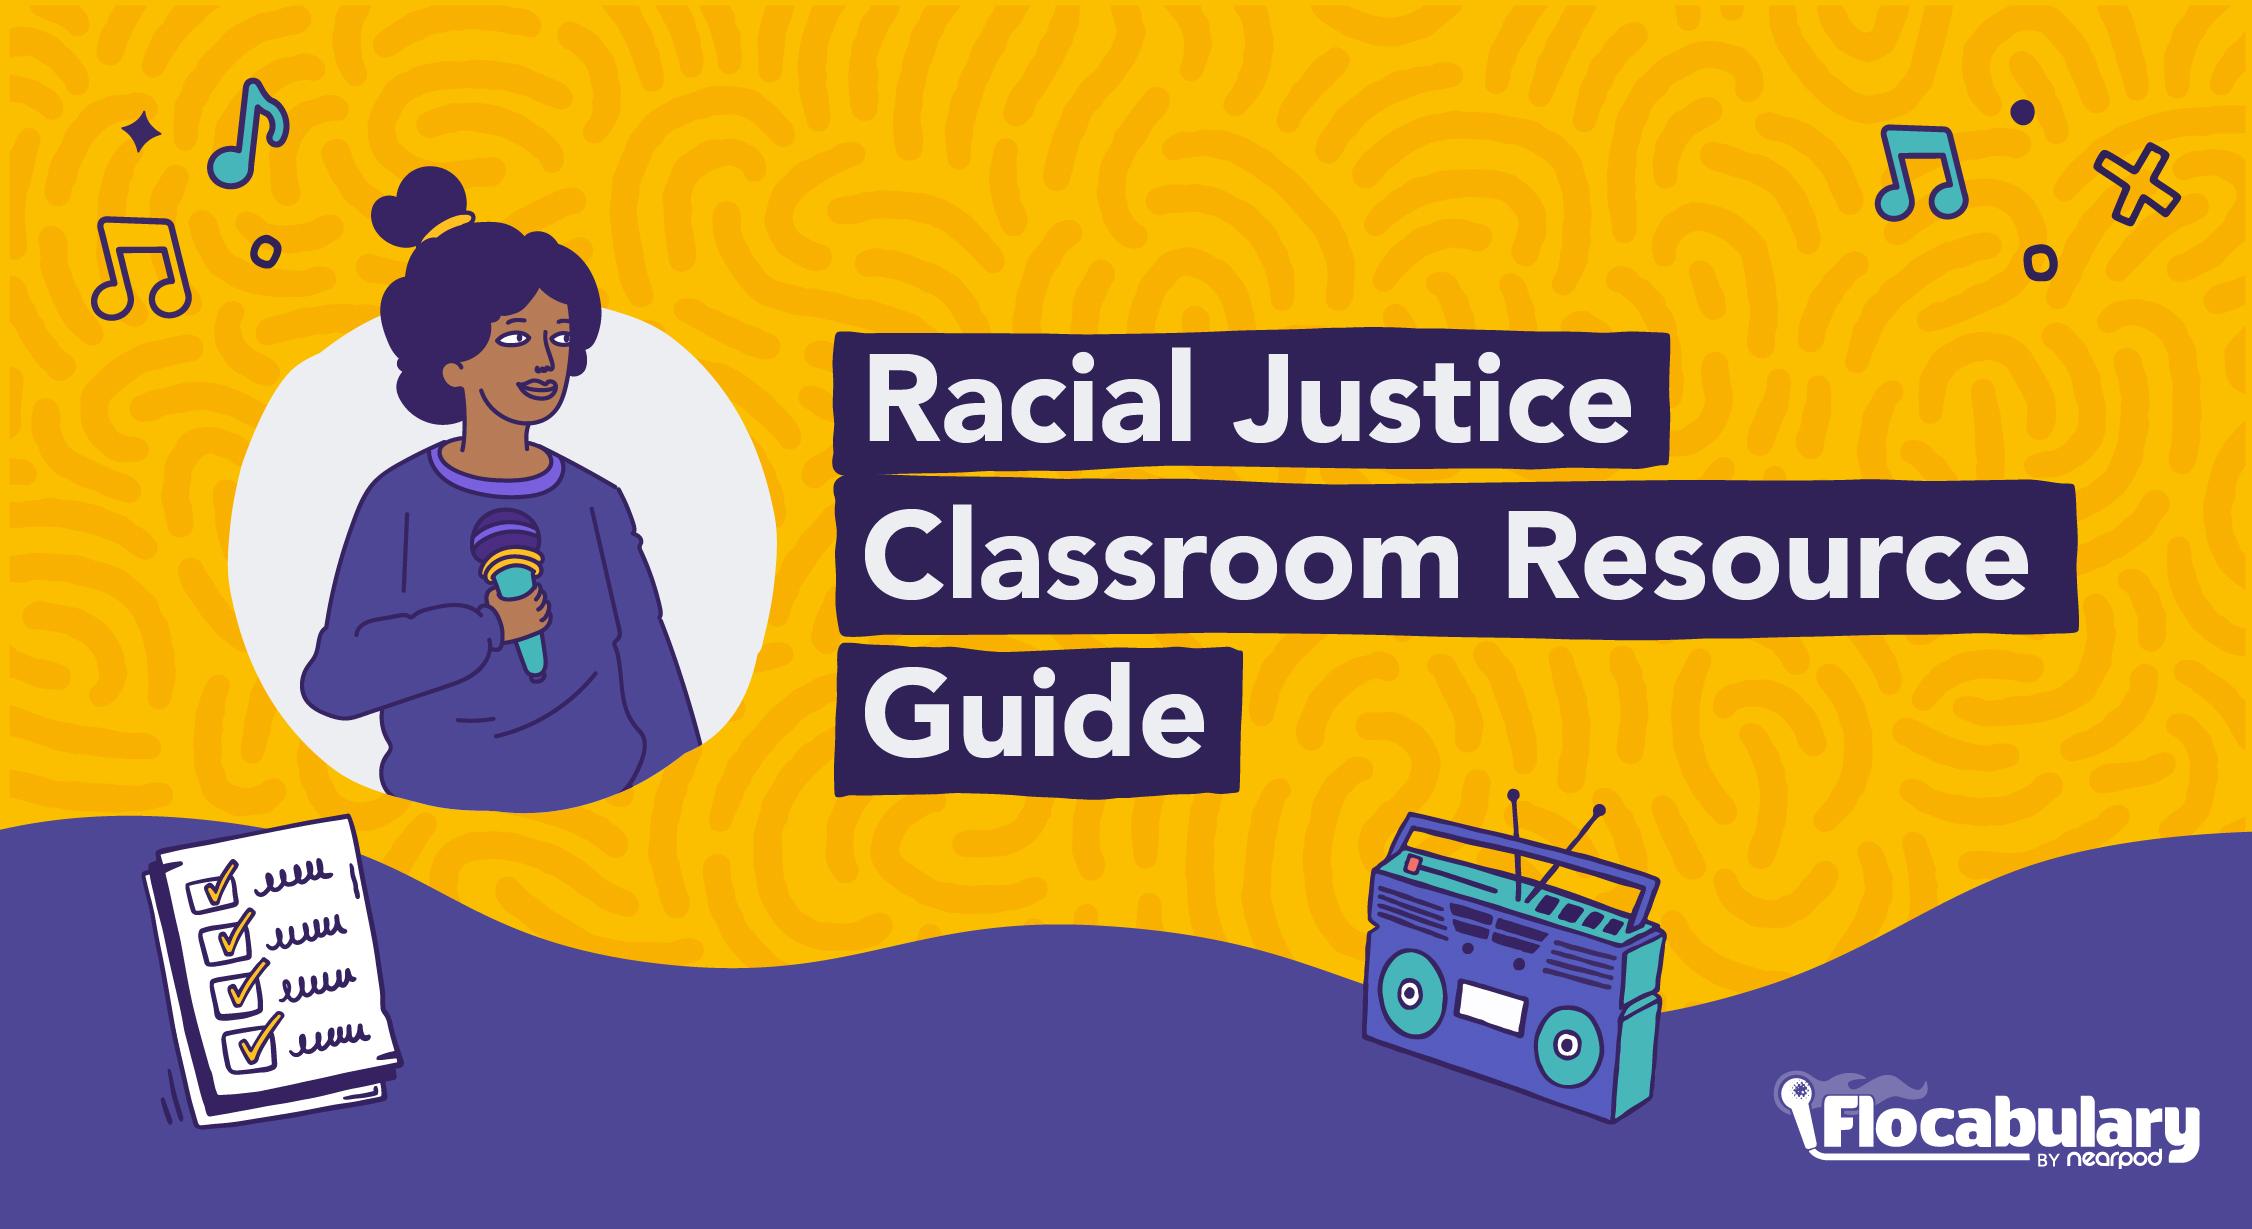 Racial Justice Classroom Resource Guide